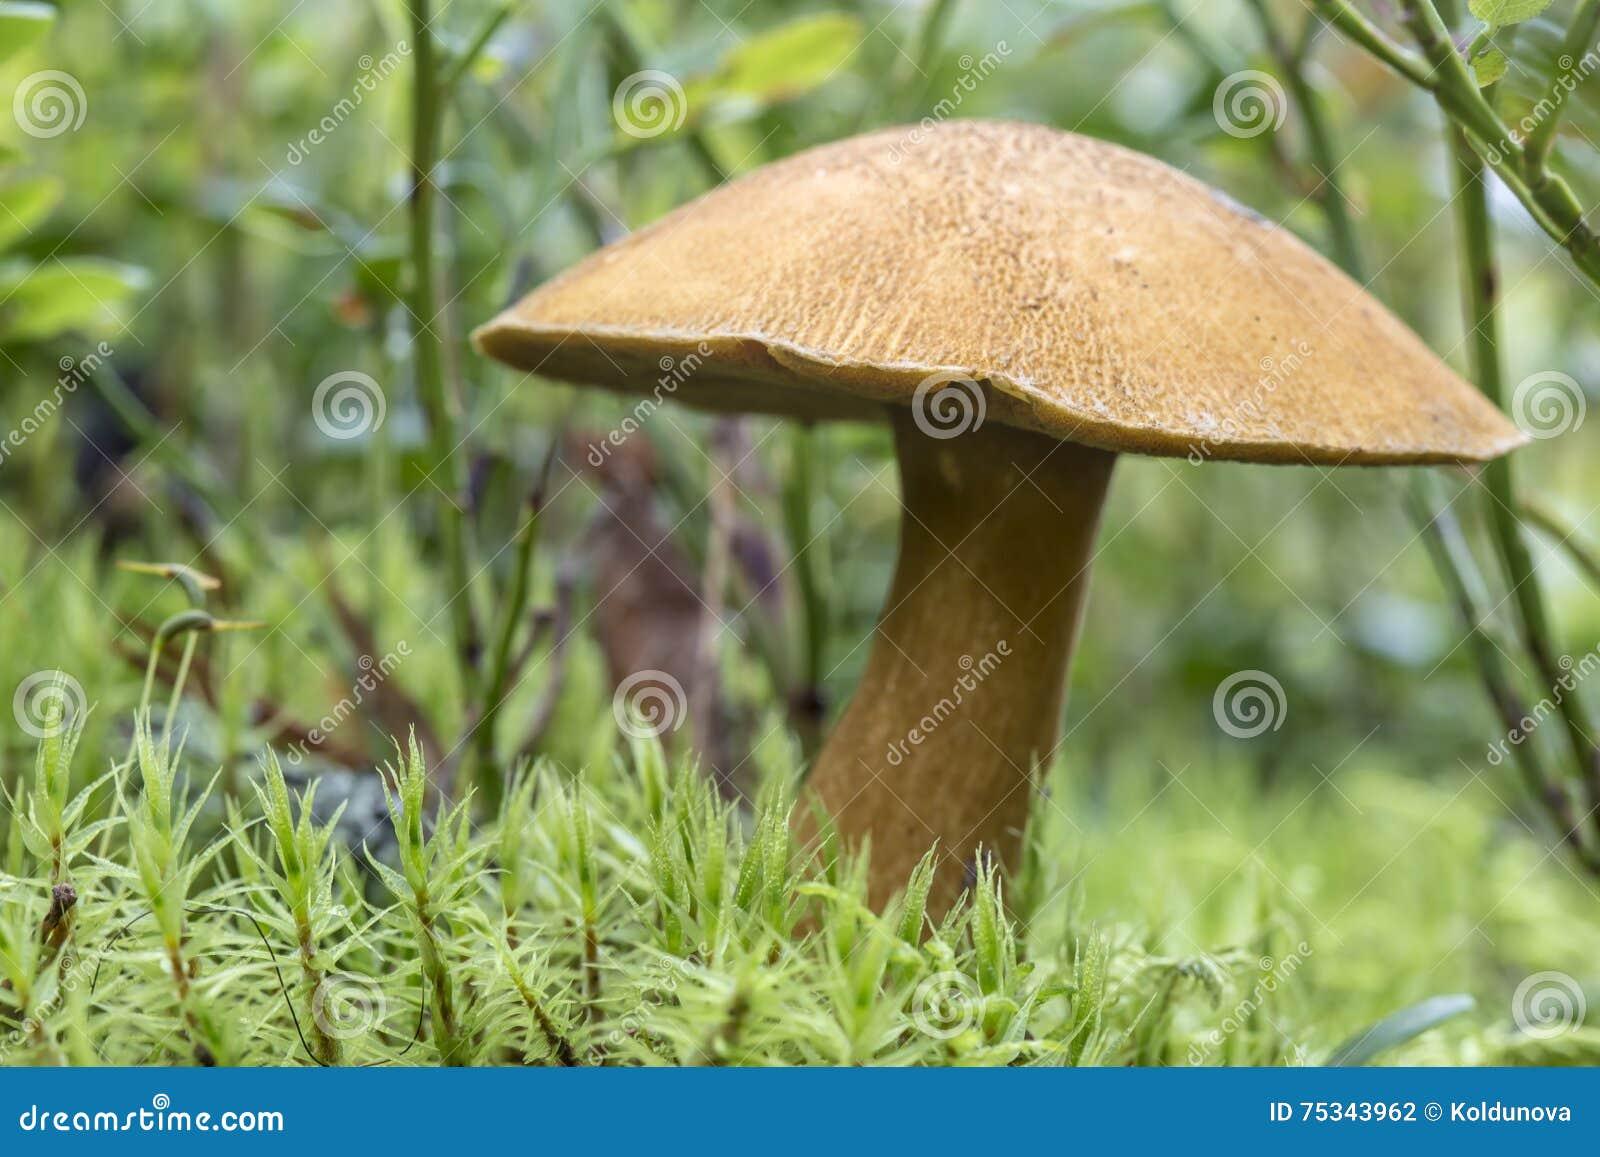 Edible mushroom xerocomus subtomentosus in moss macro